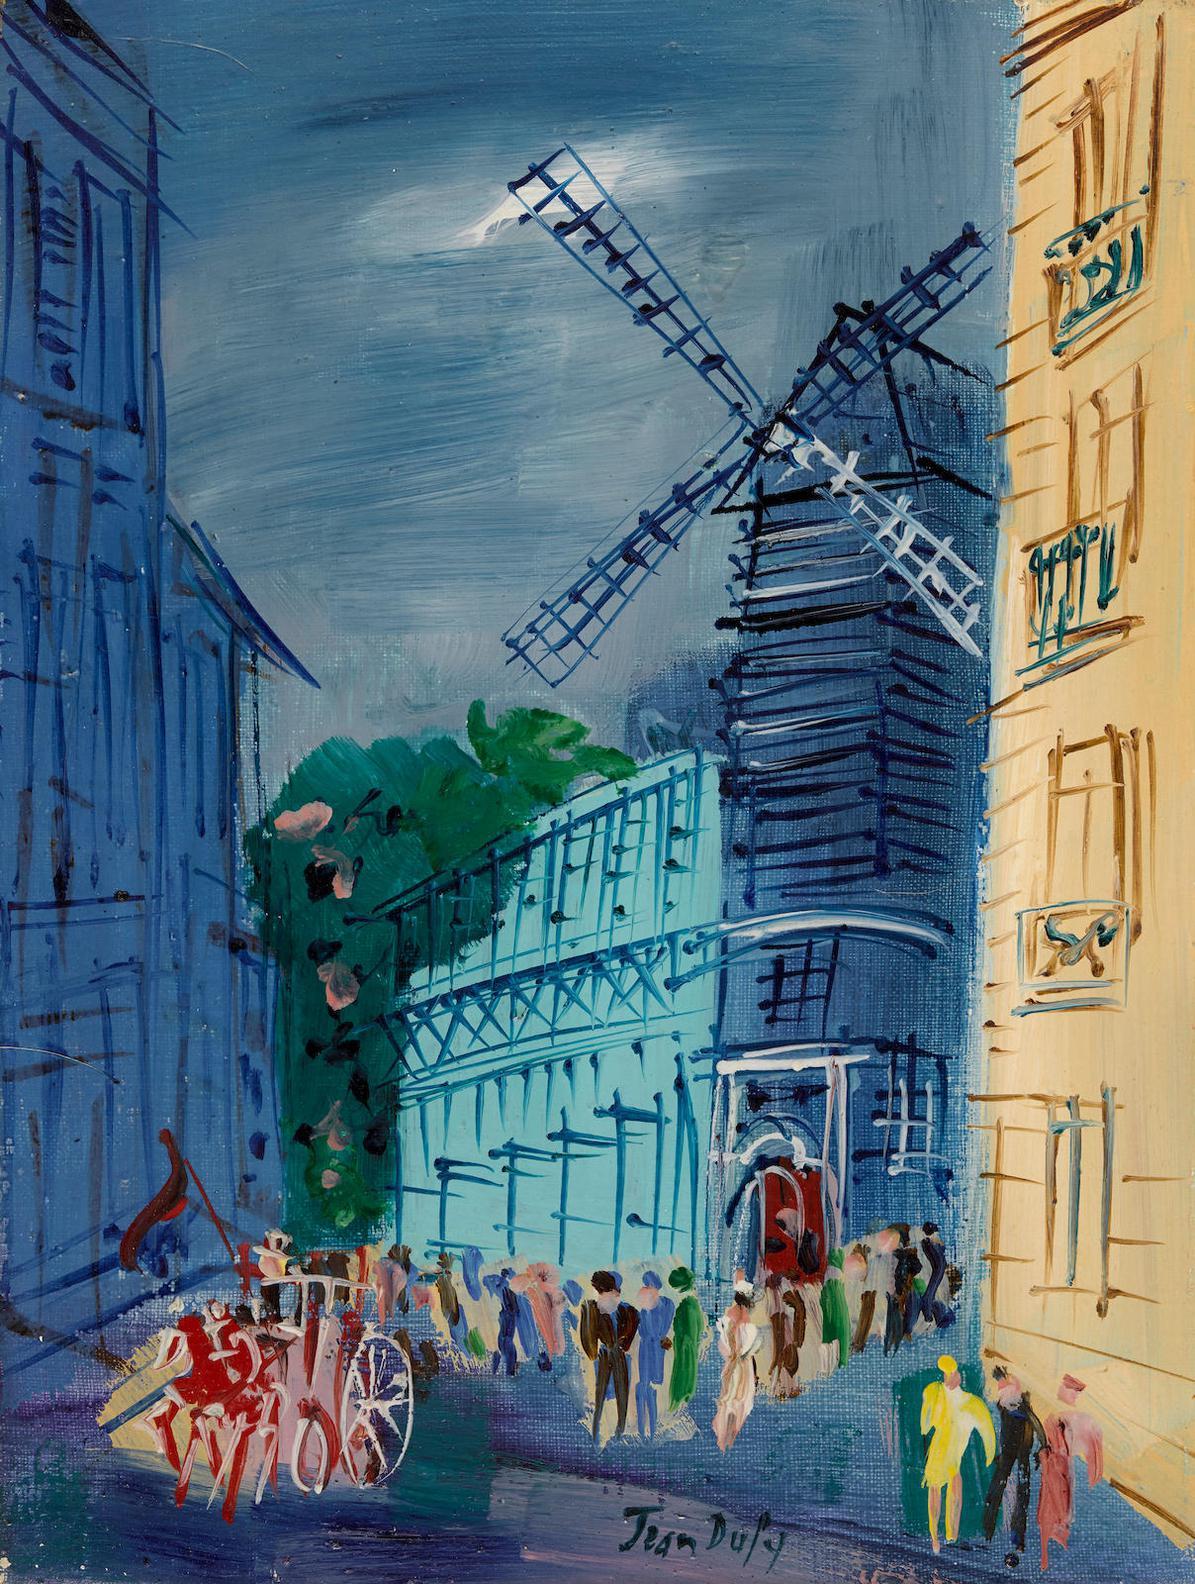 Jean Dufy-Le Moulin De La Galette-